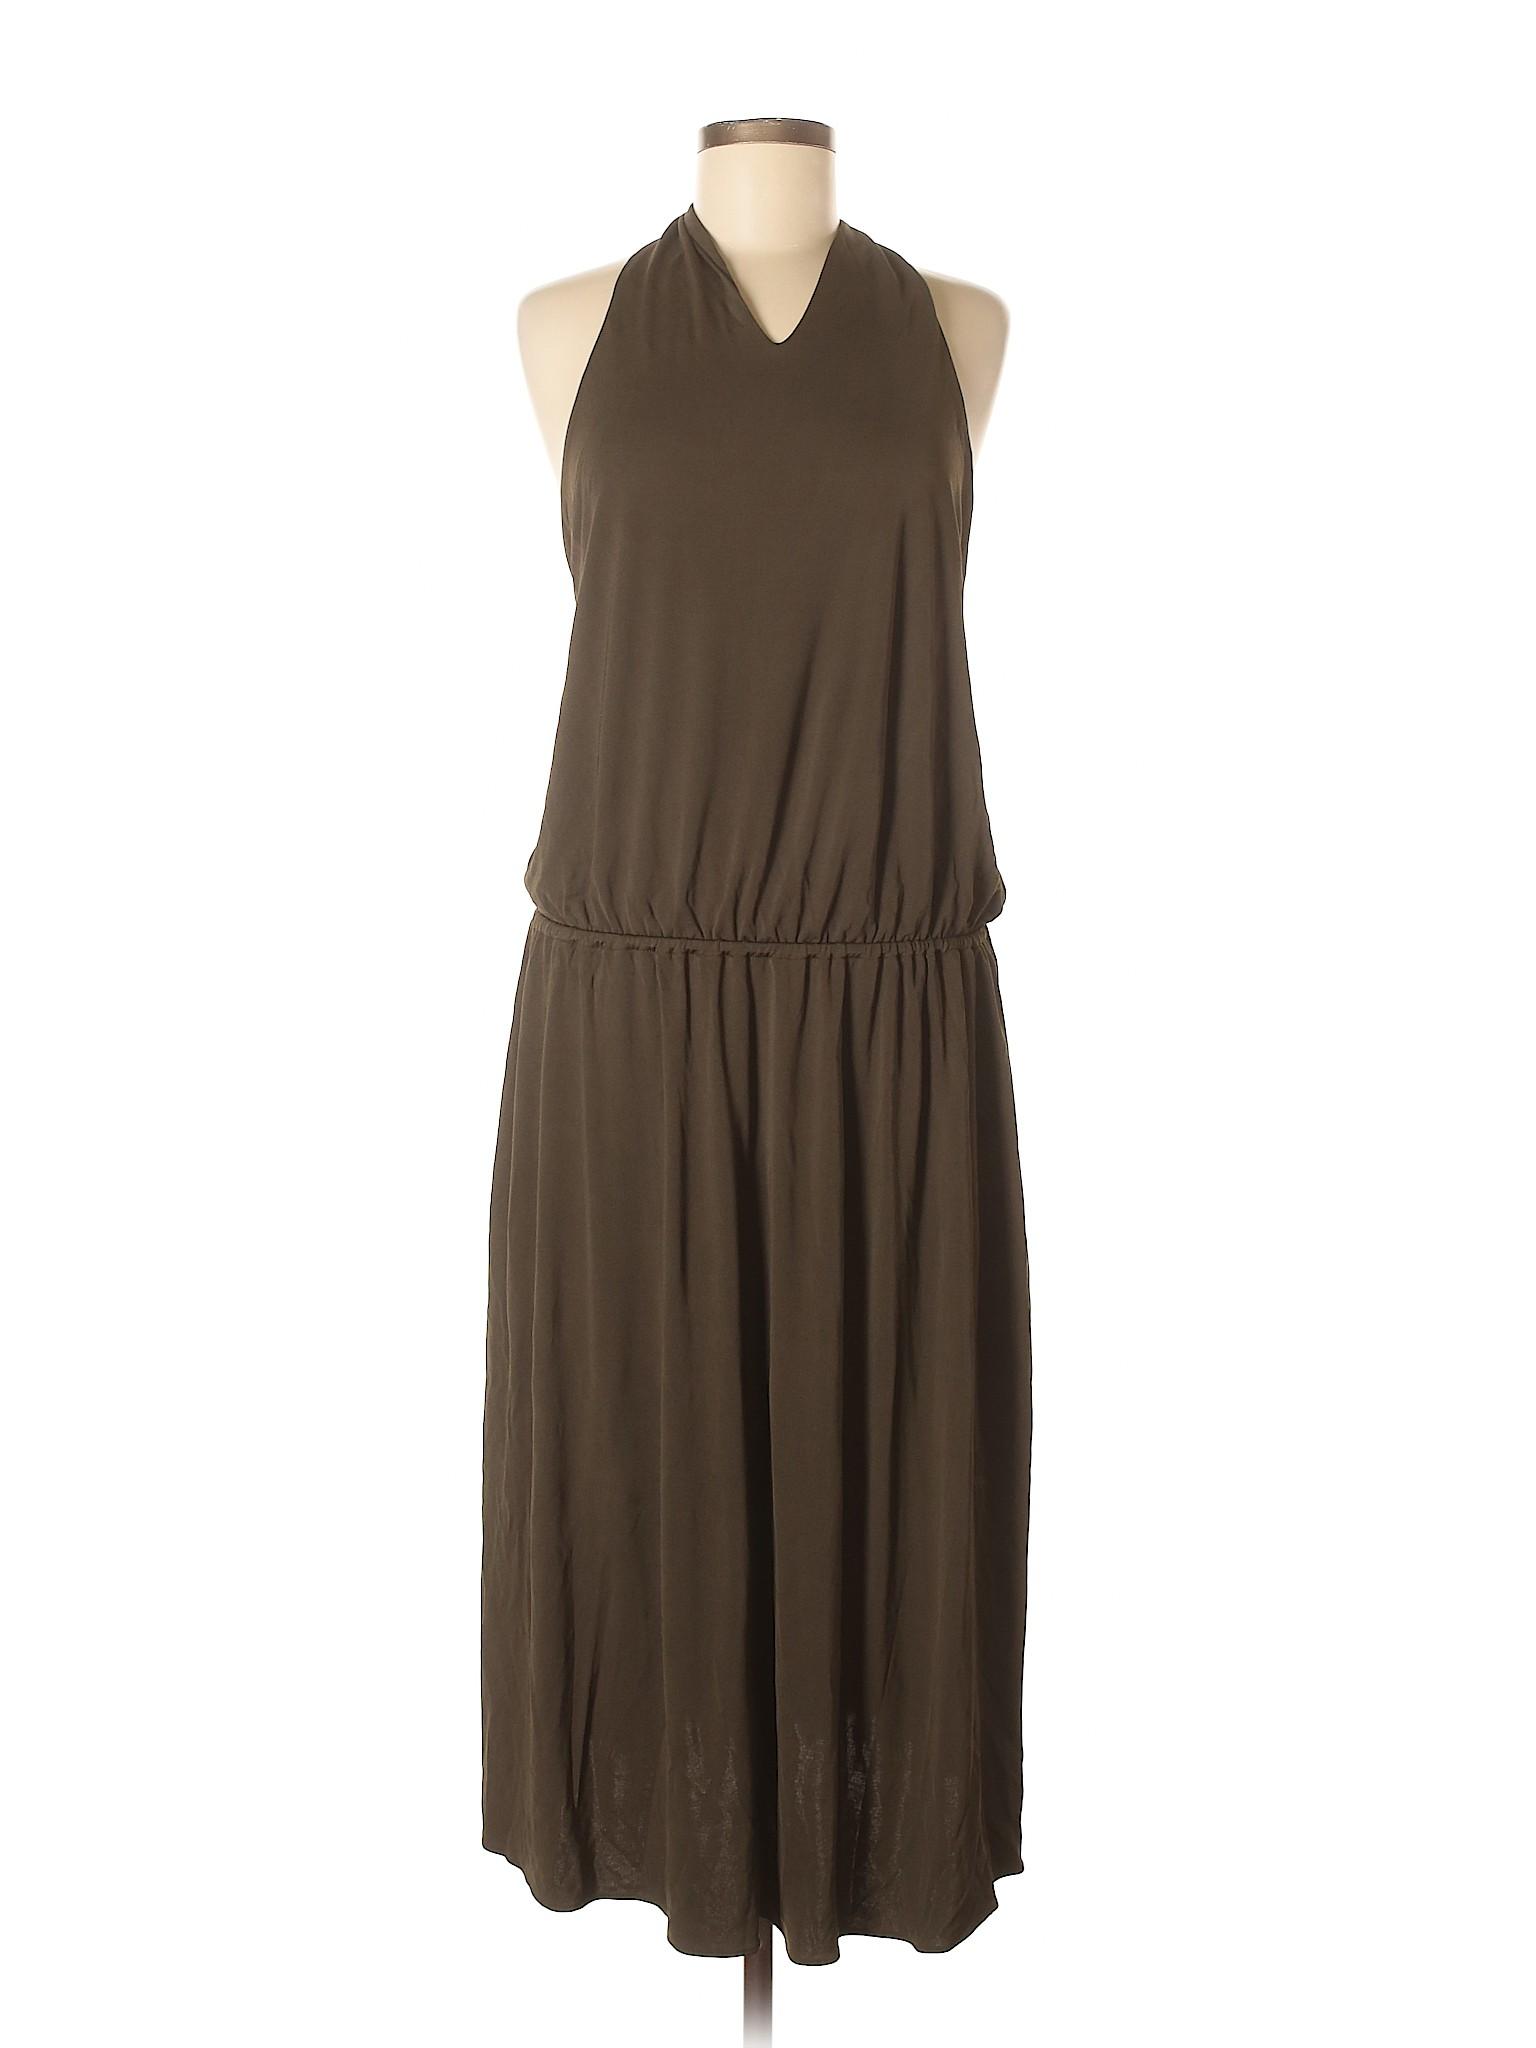 Boutique Republic Banana Dress Casual winter r1rwx6